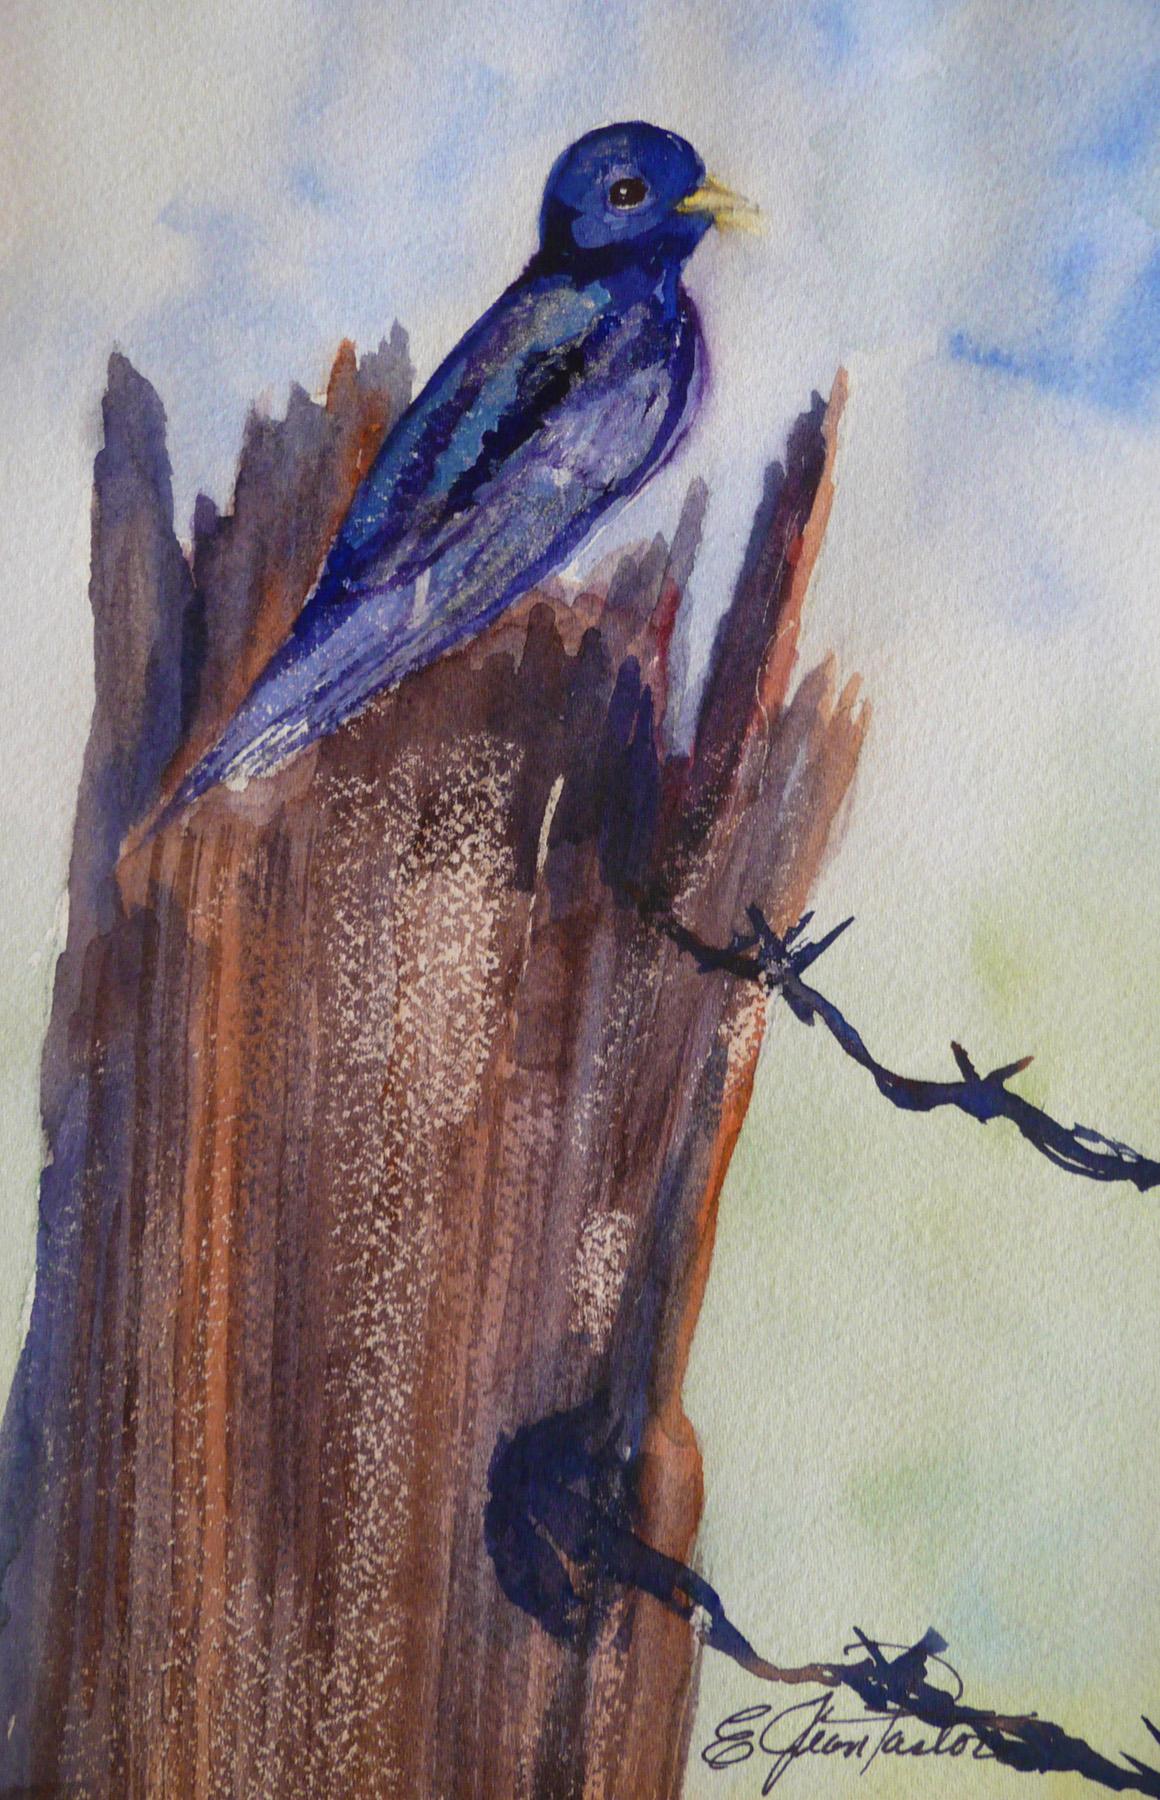 PURPLE MARTIN by  Jean Pastore - Masterpiece Online